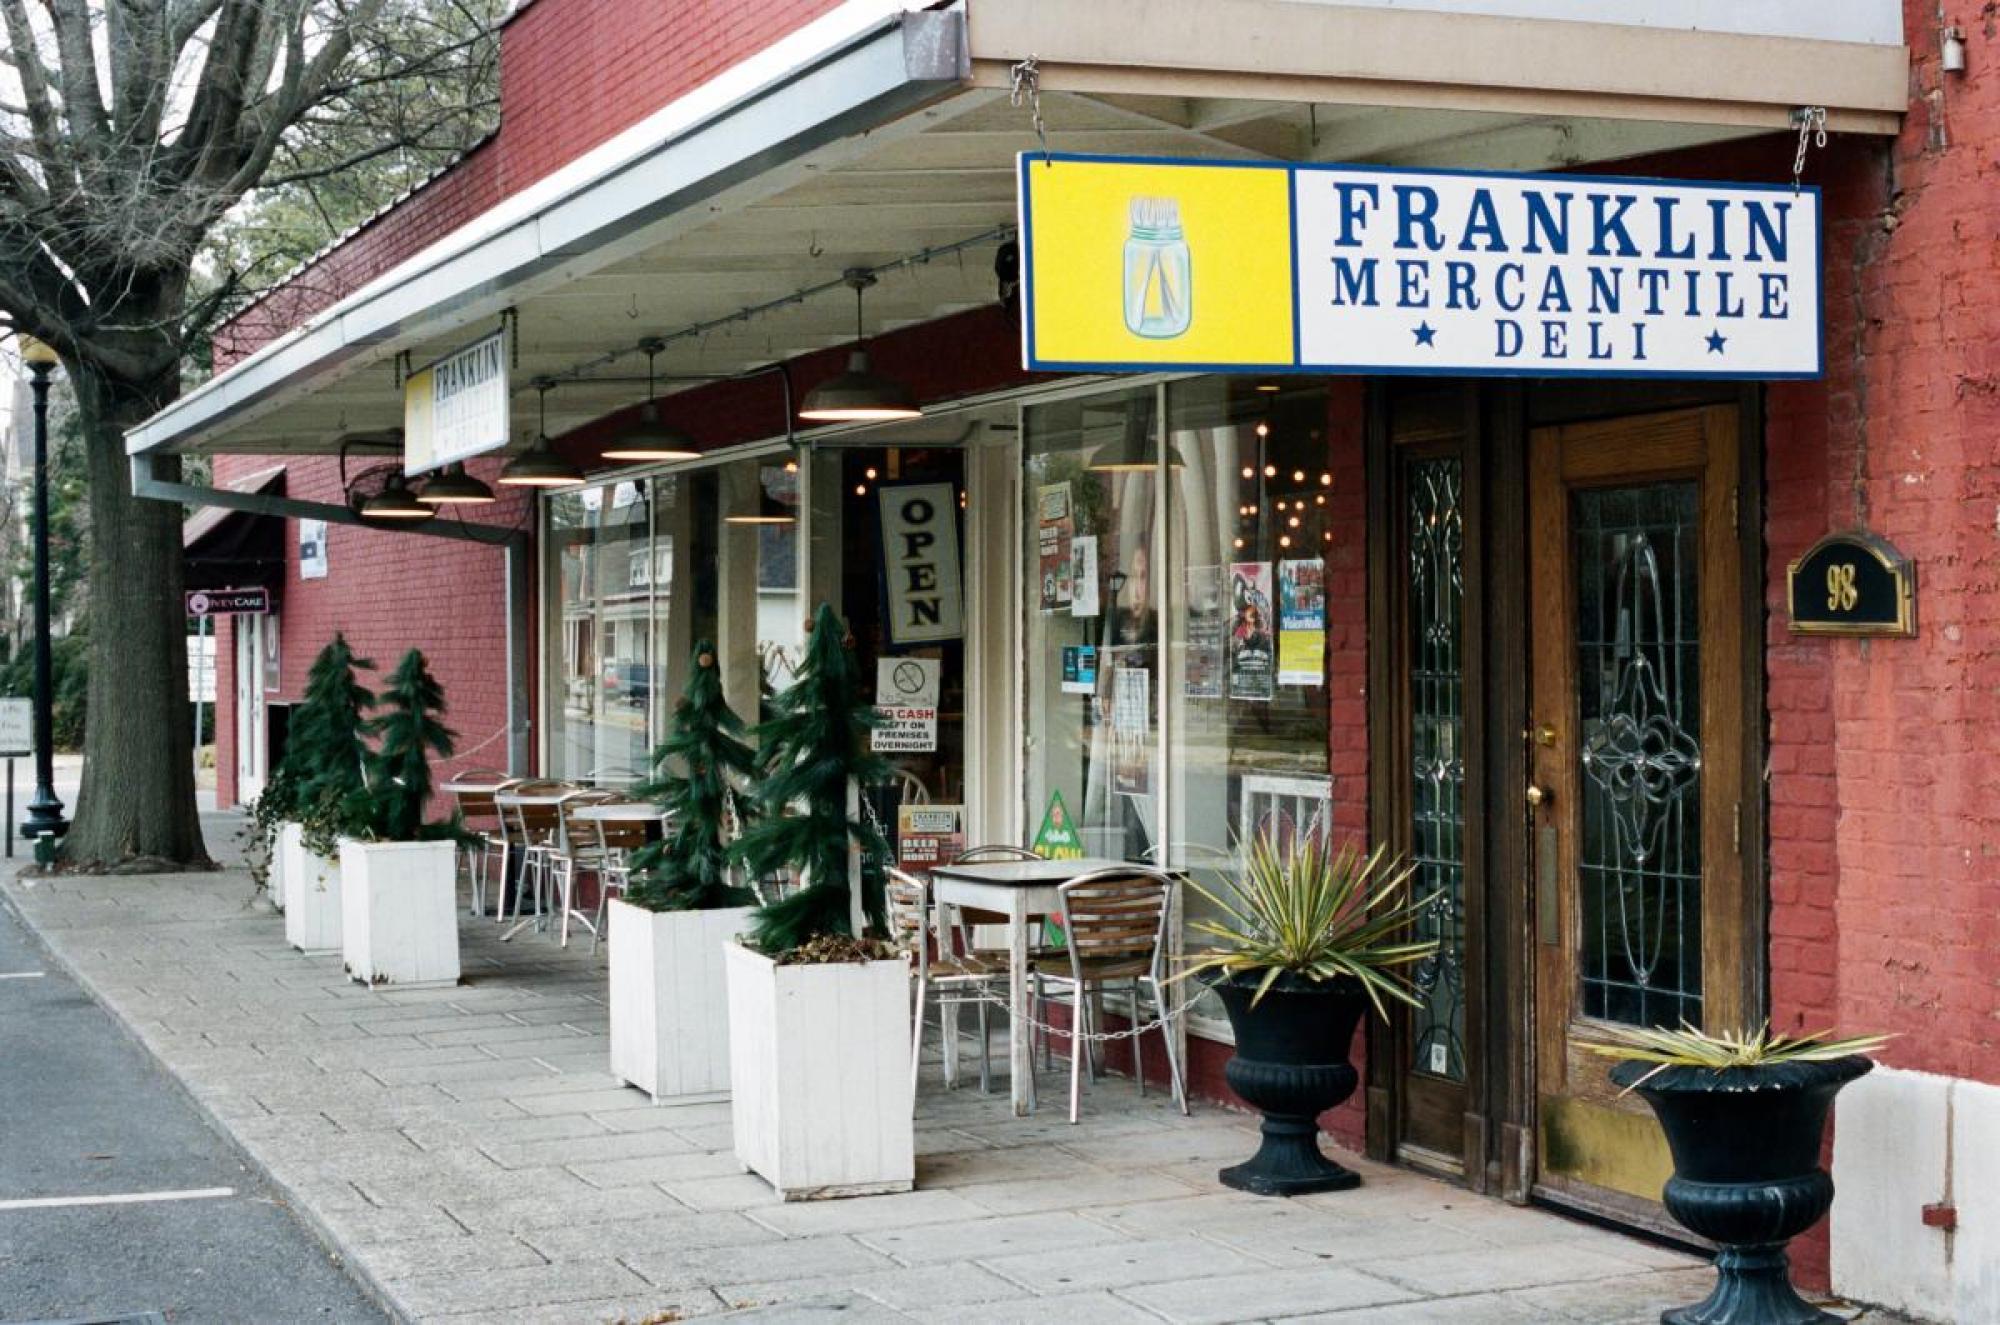 Franklin Mercantile